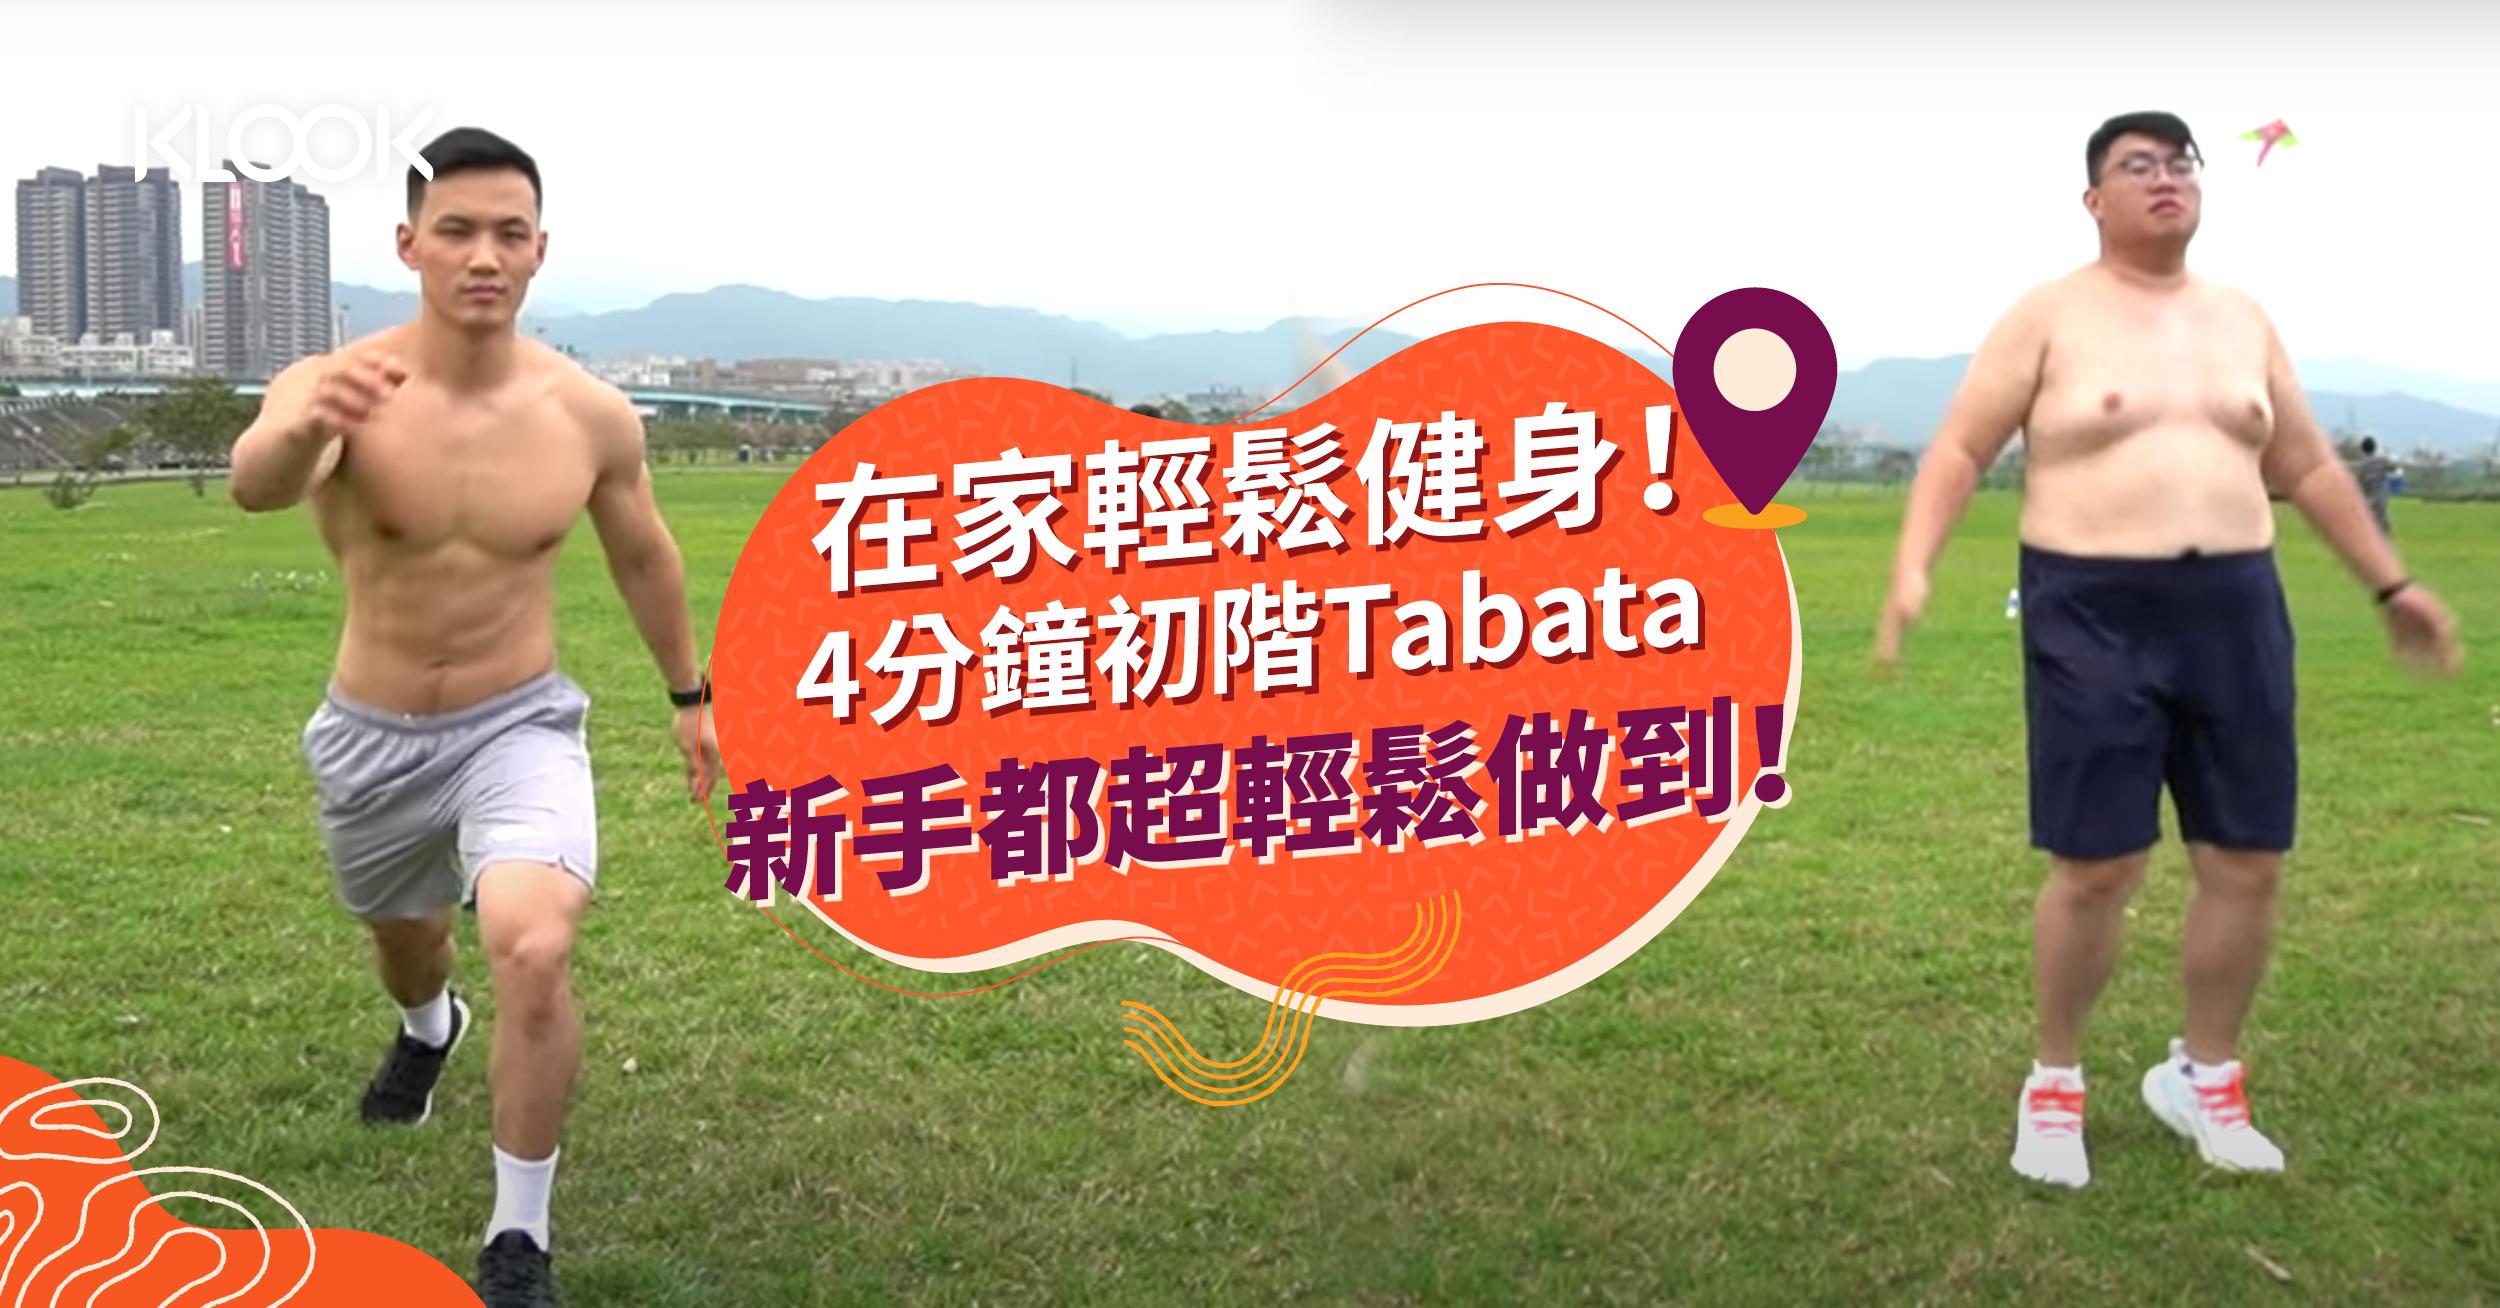 【Tabata 訓練】4分鐘初階Tabata 在家輕鬆減肥健身!